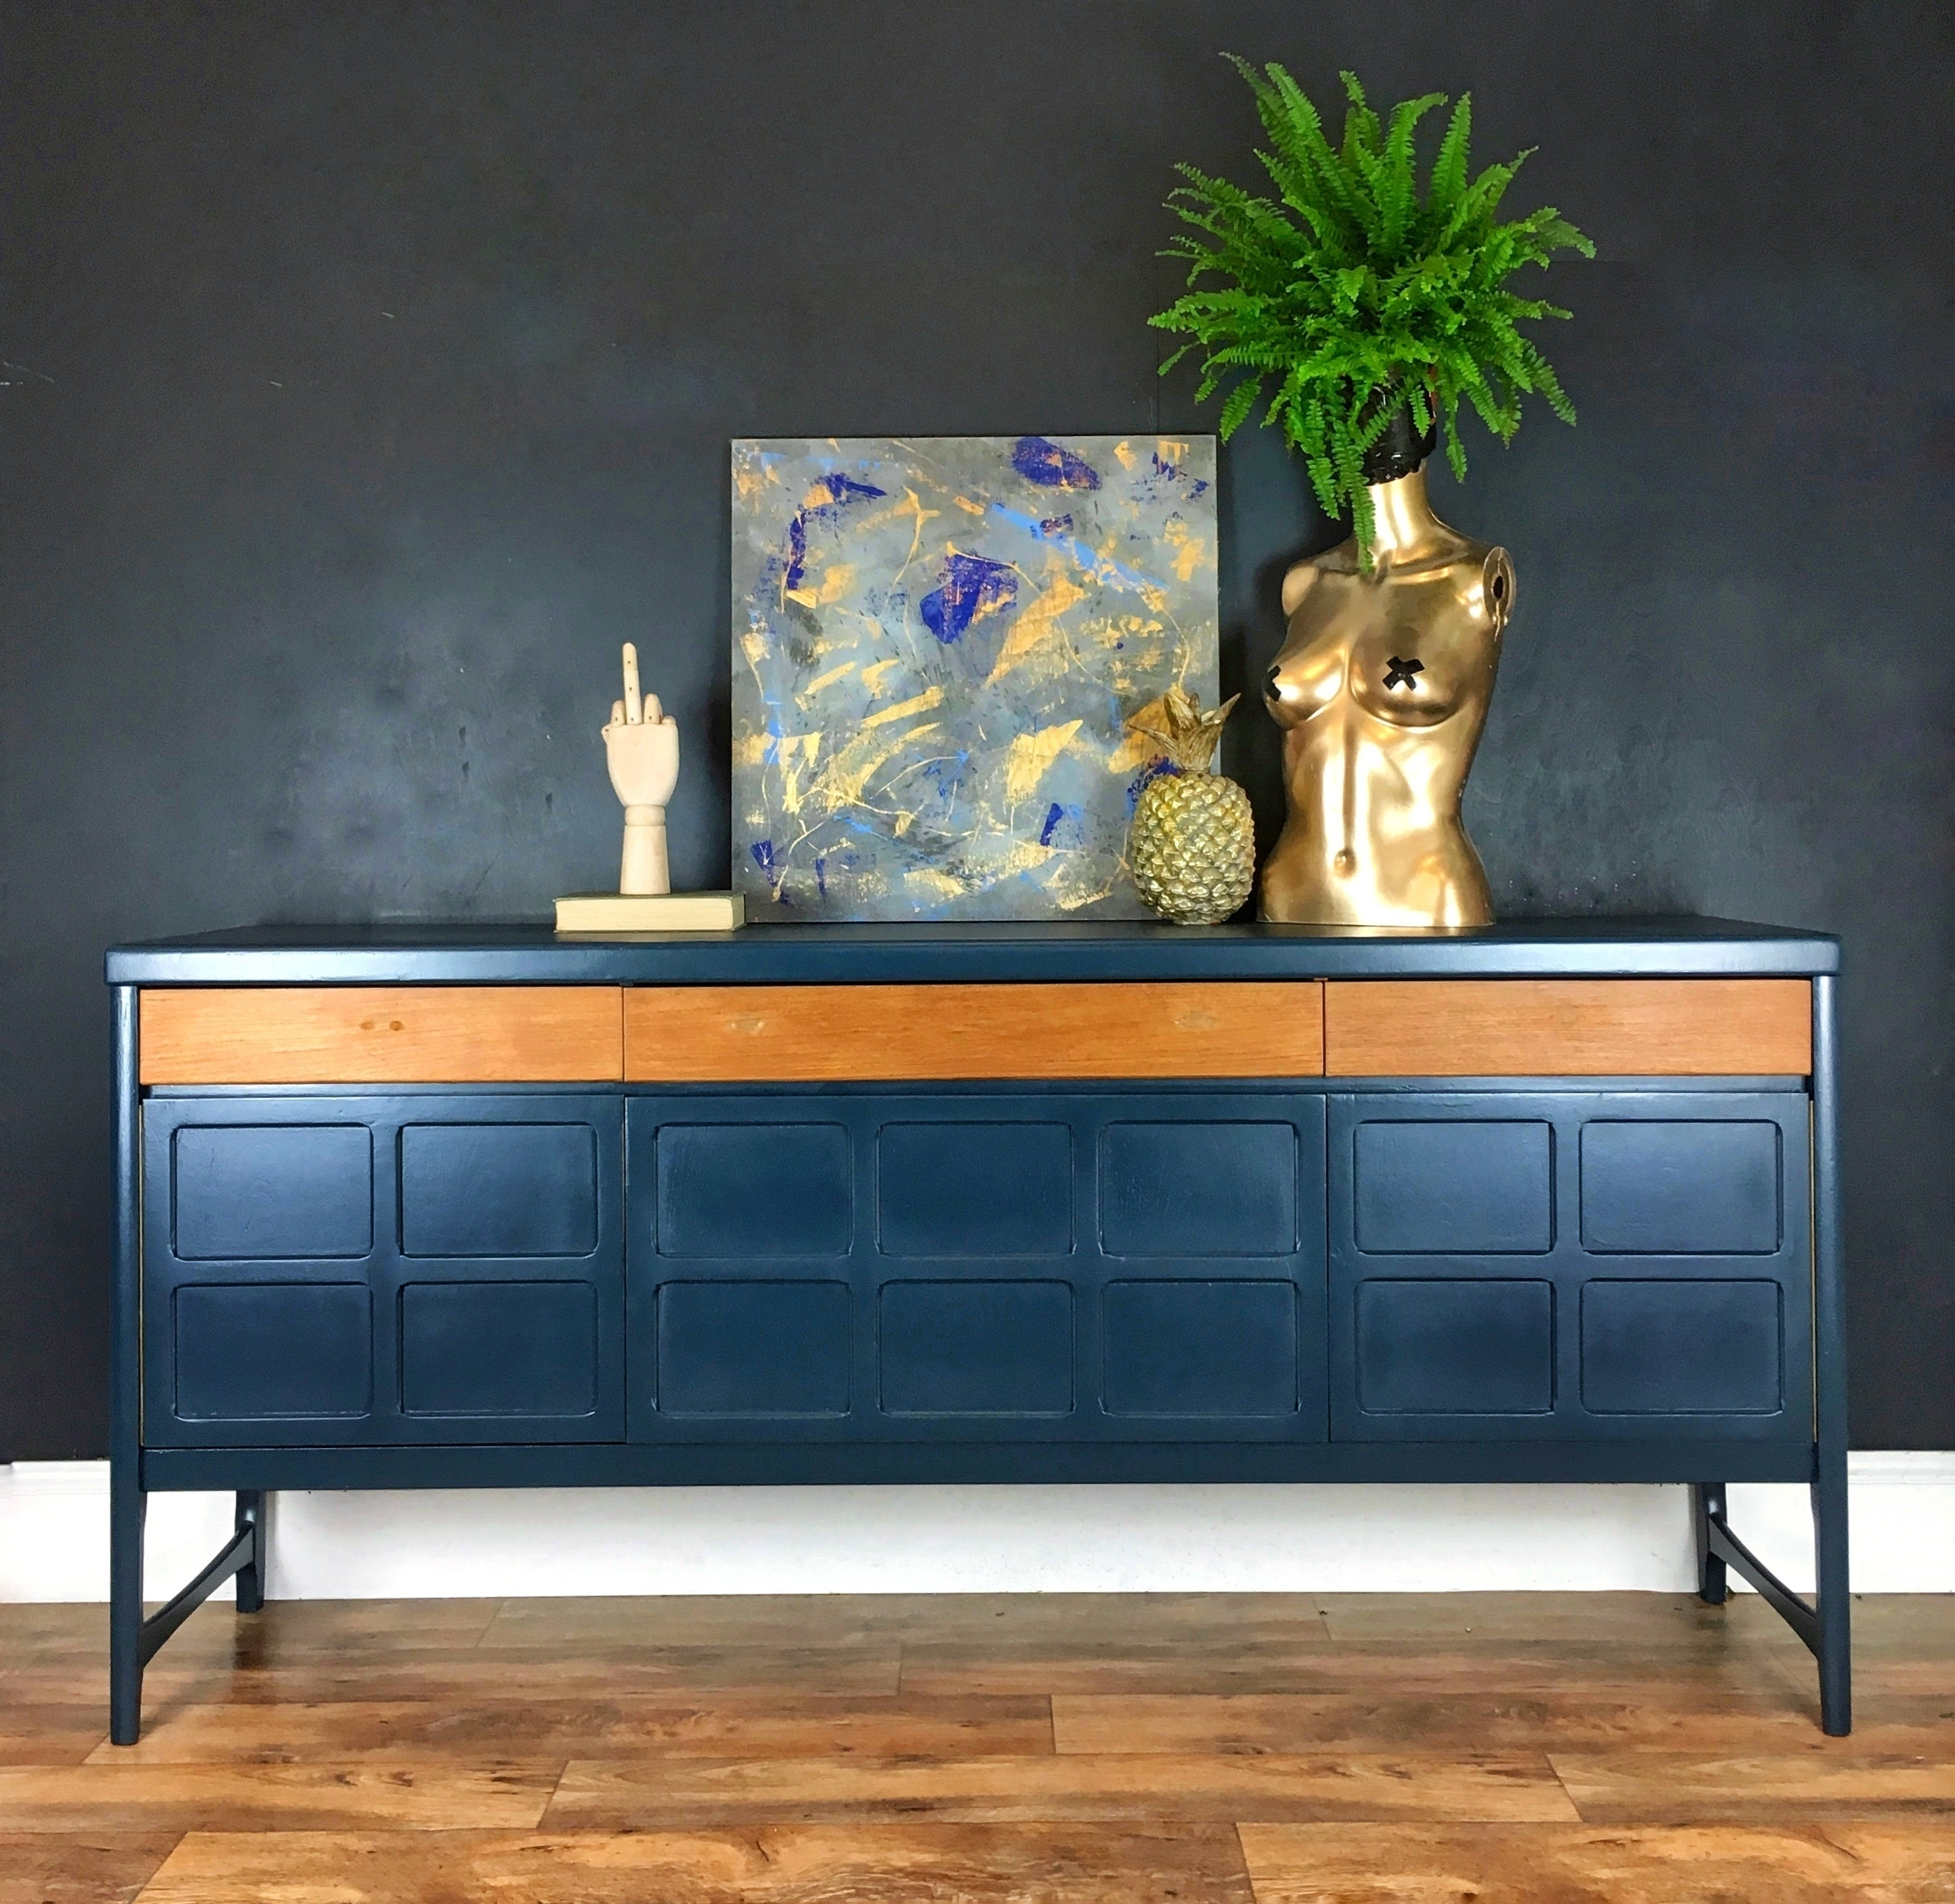 Farrow And Ball Hague Blue.Nathan Sideboard Painted In Farrow And Ball Hague Blue